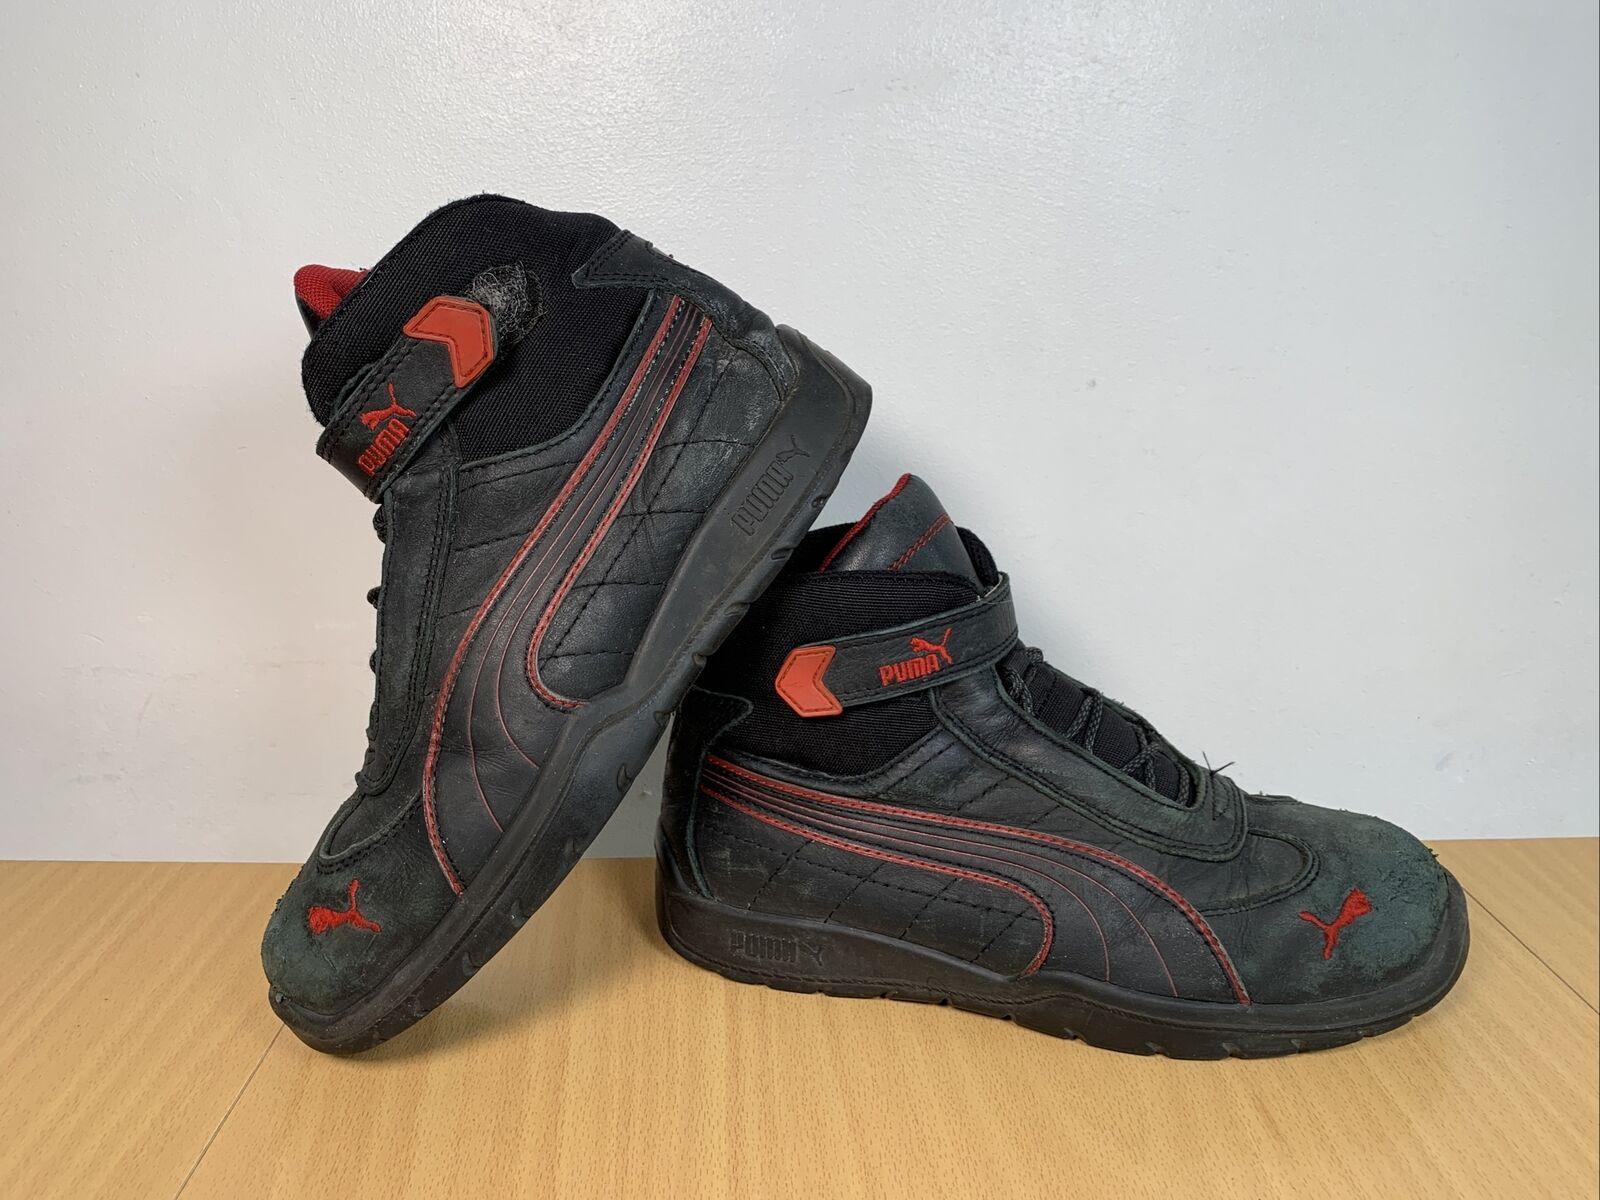 PUMA Daytona Mid Mens Safety Boots Composite Toe Size UK 7 EUR 41